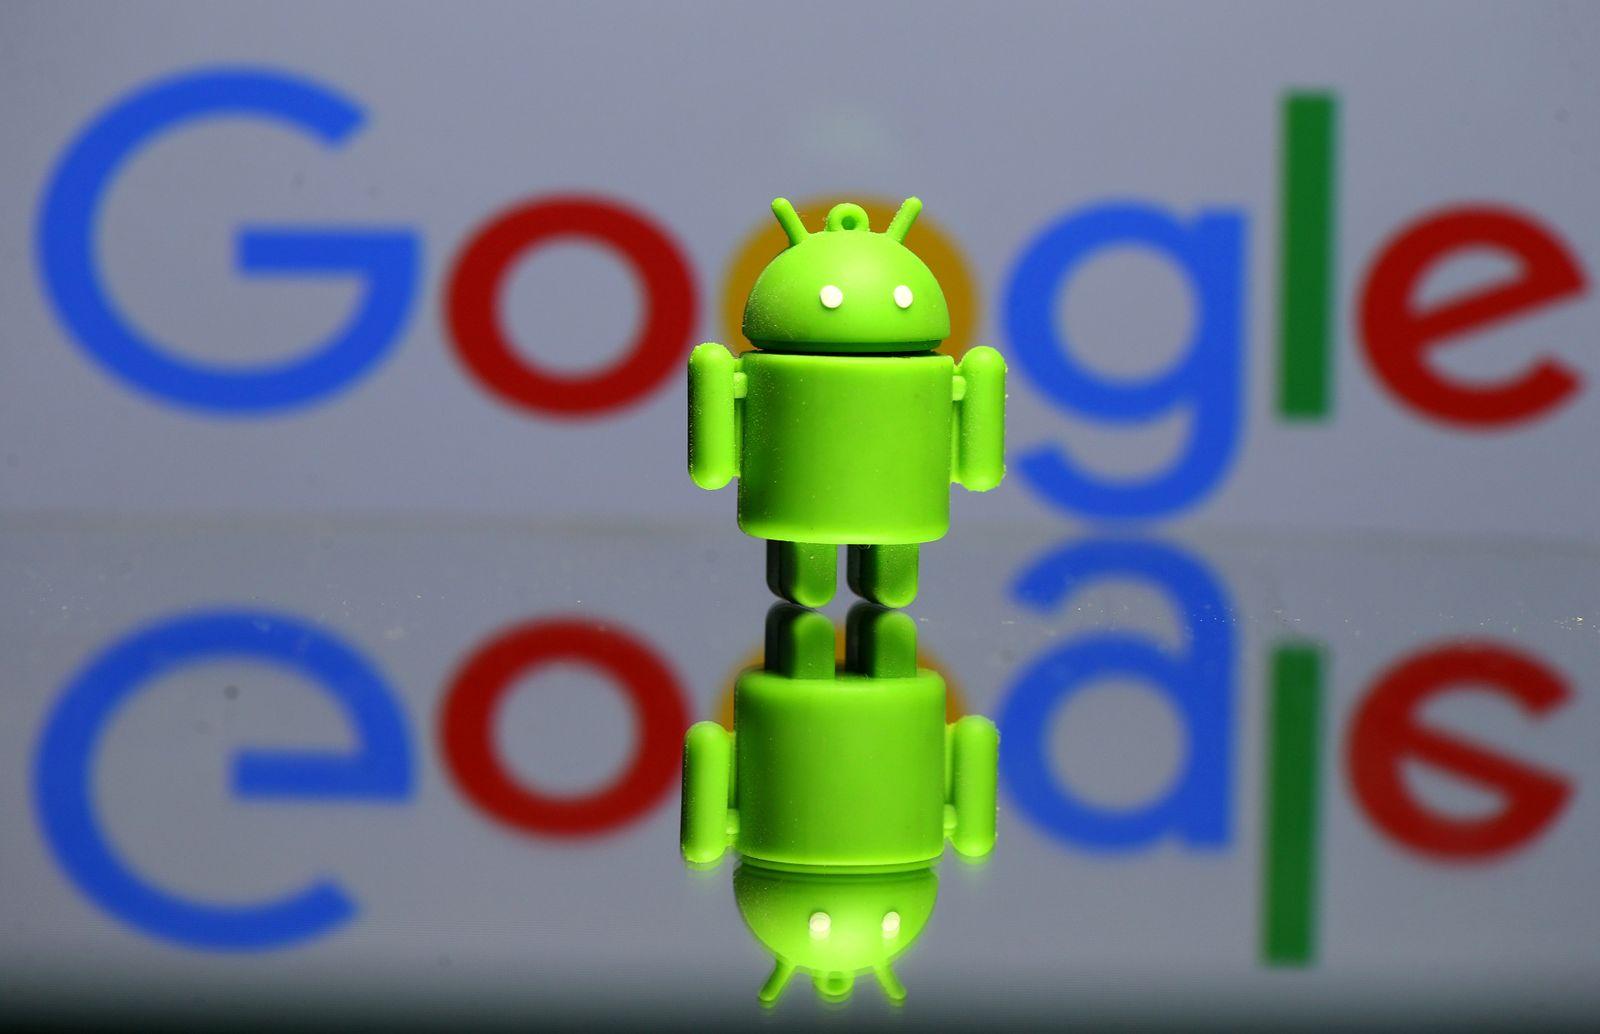 EU / Google / Android